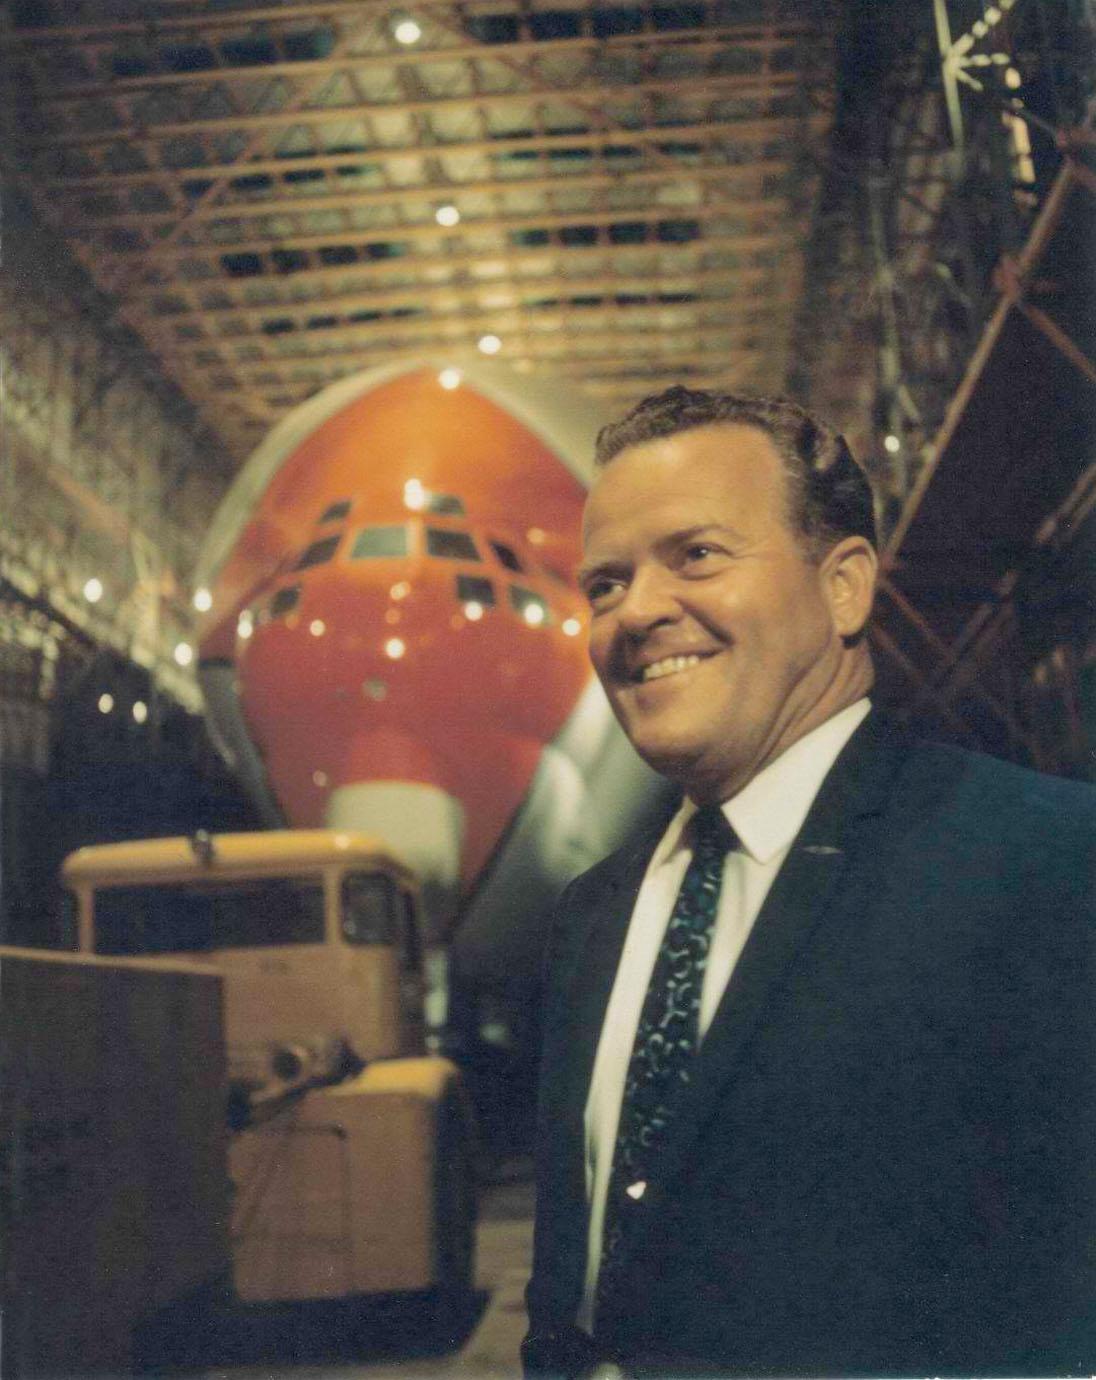 HighFlight Guppy1 John Conroy, inventor of the Pregnant Guppy and Super Guppy.